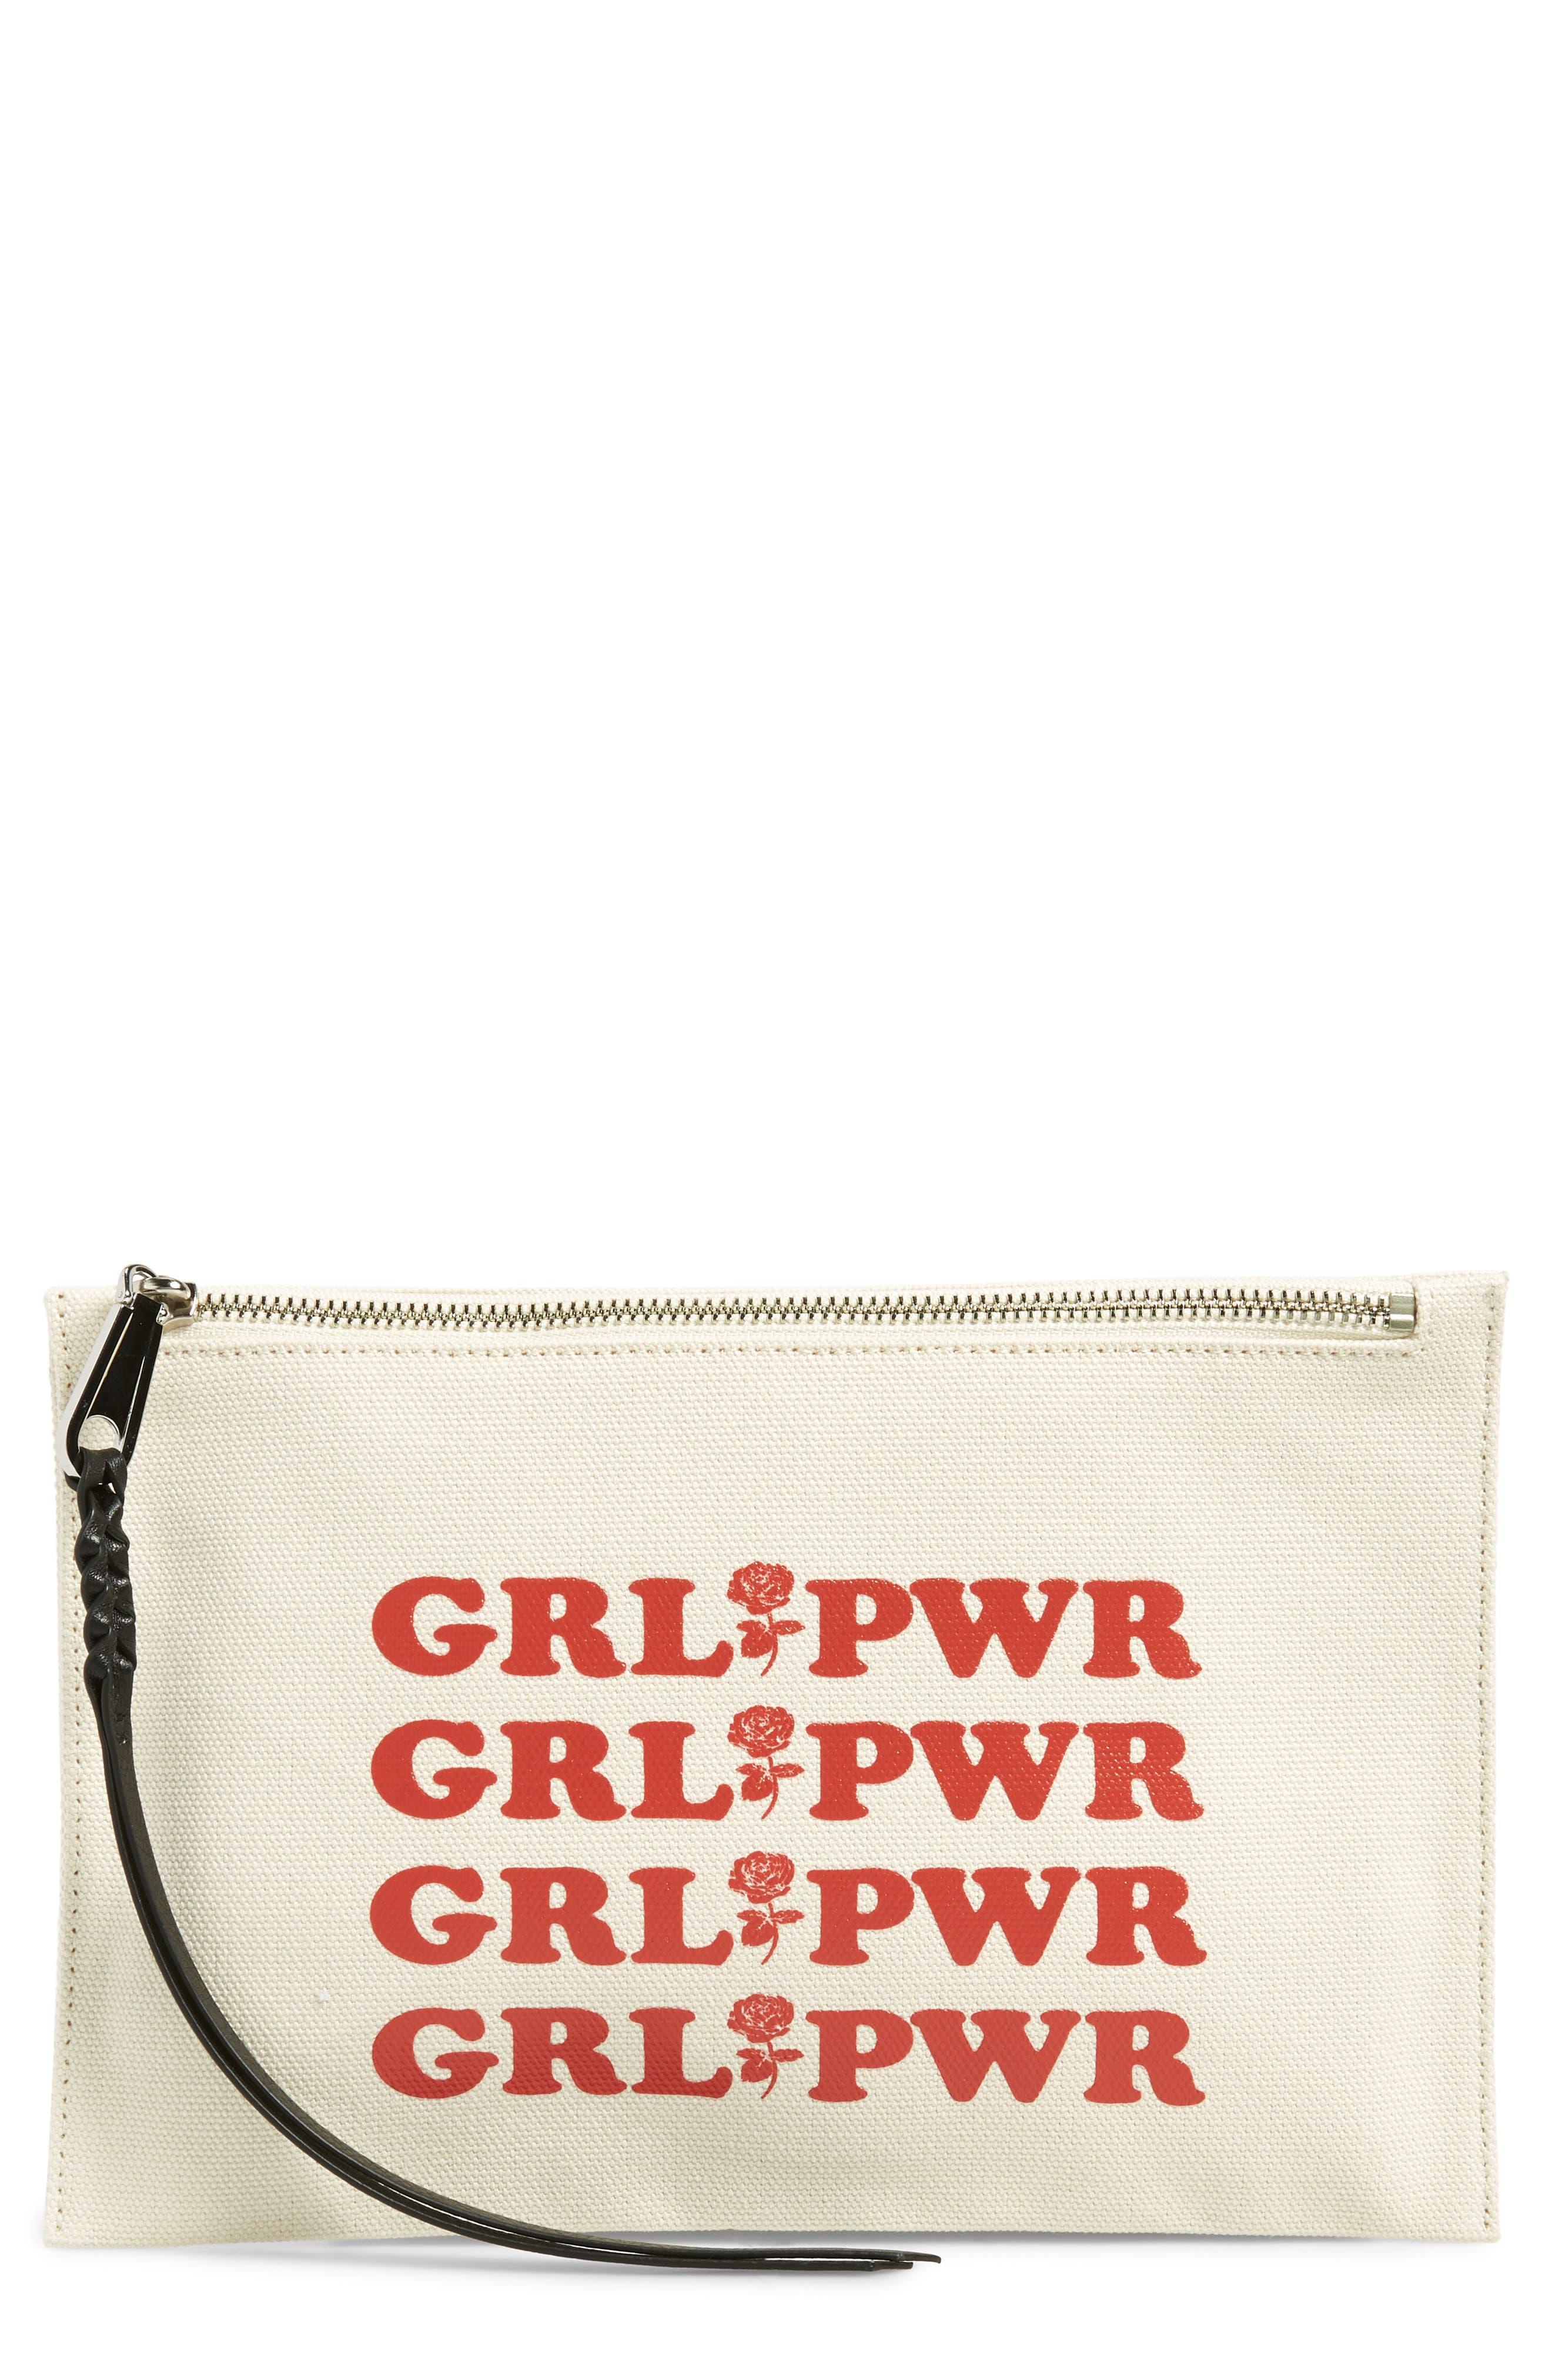 Girl Power Medium Zip Pouch,                         Main,                         color, CREAM